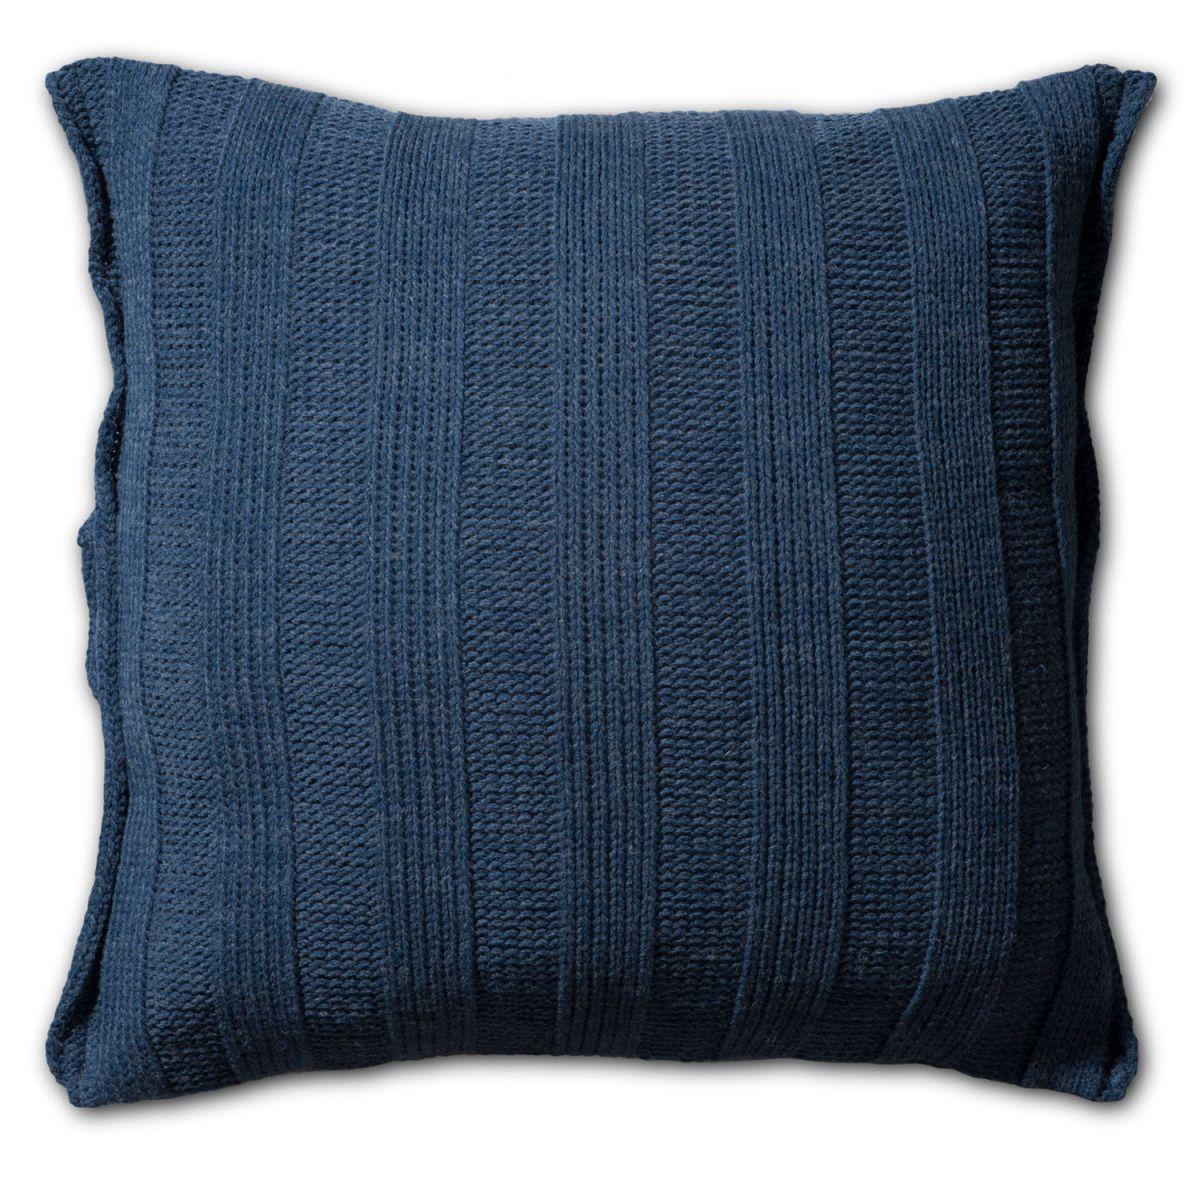 6x6 rib cushion jeans 50x50